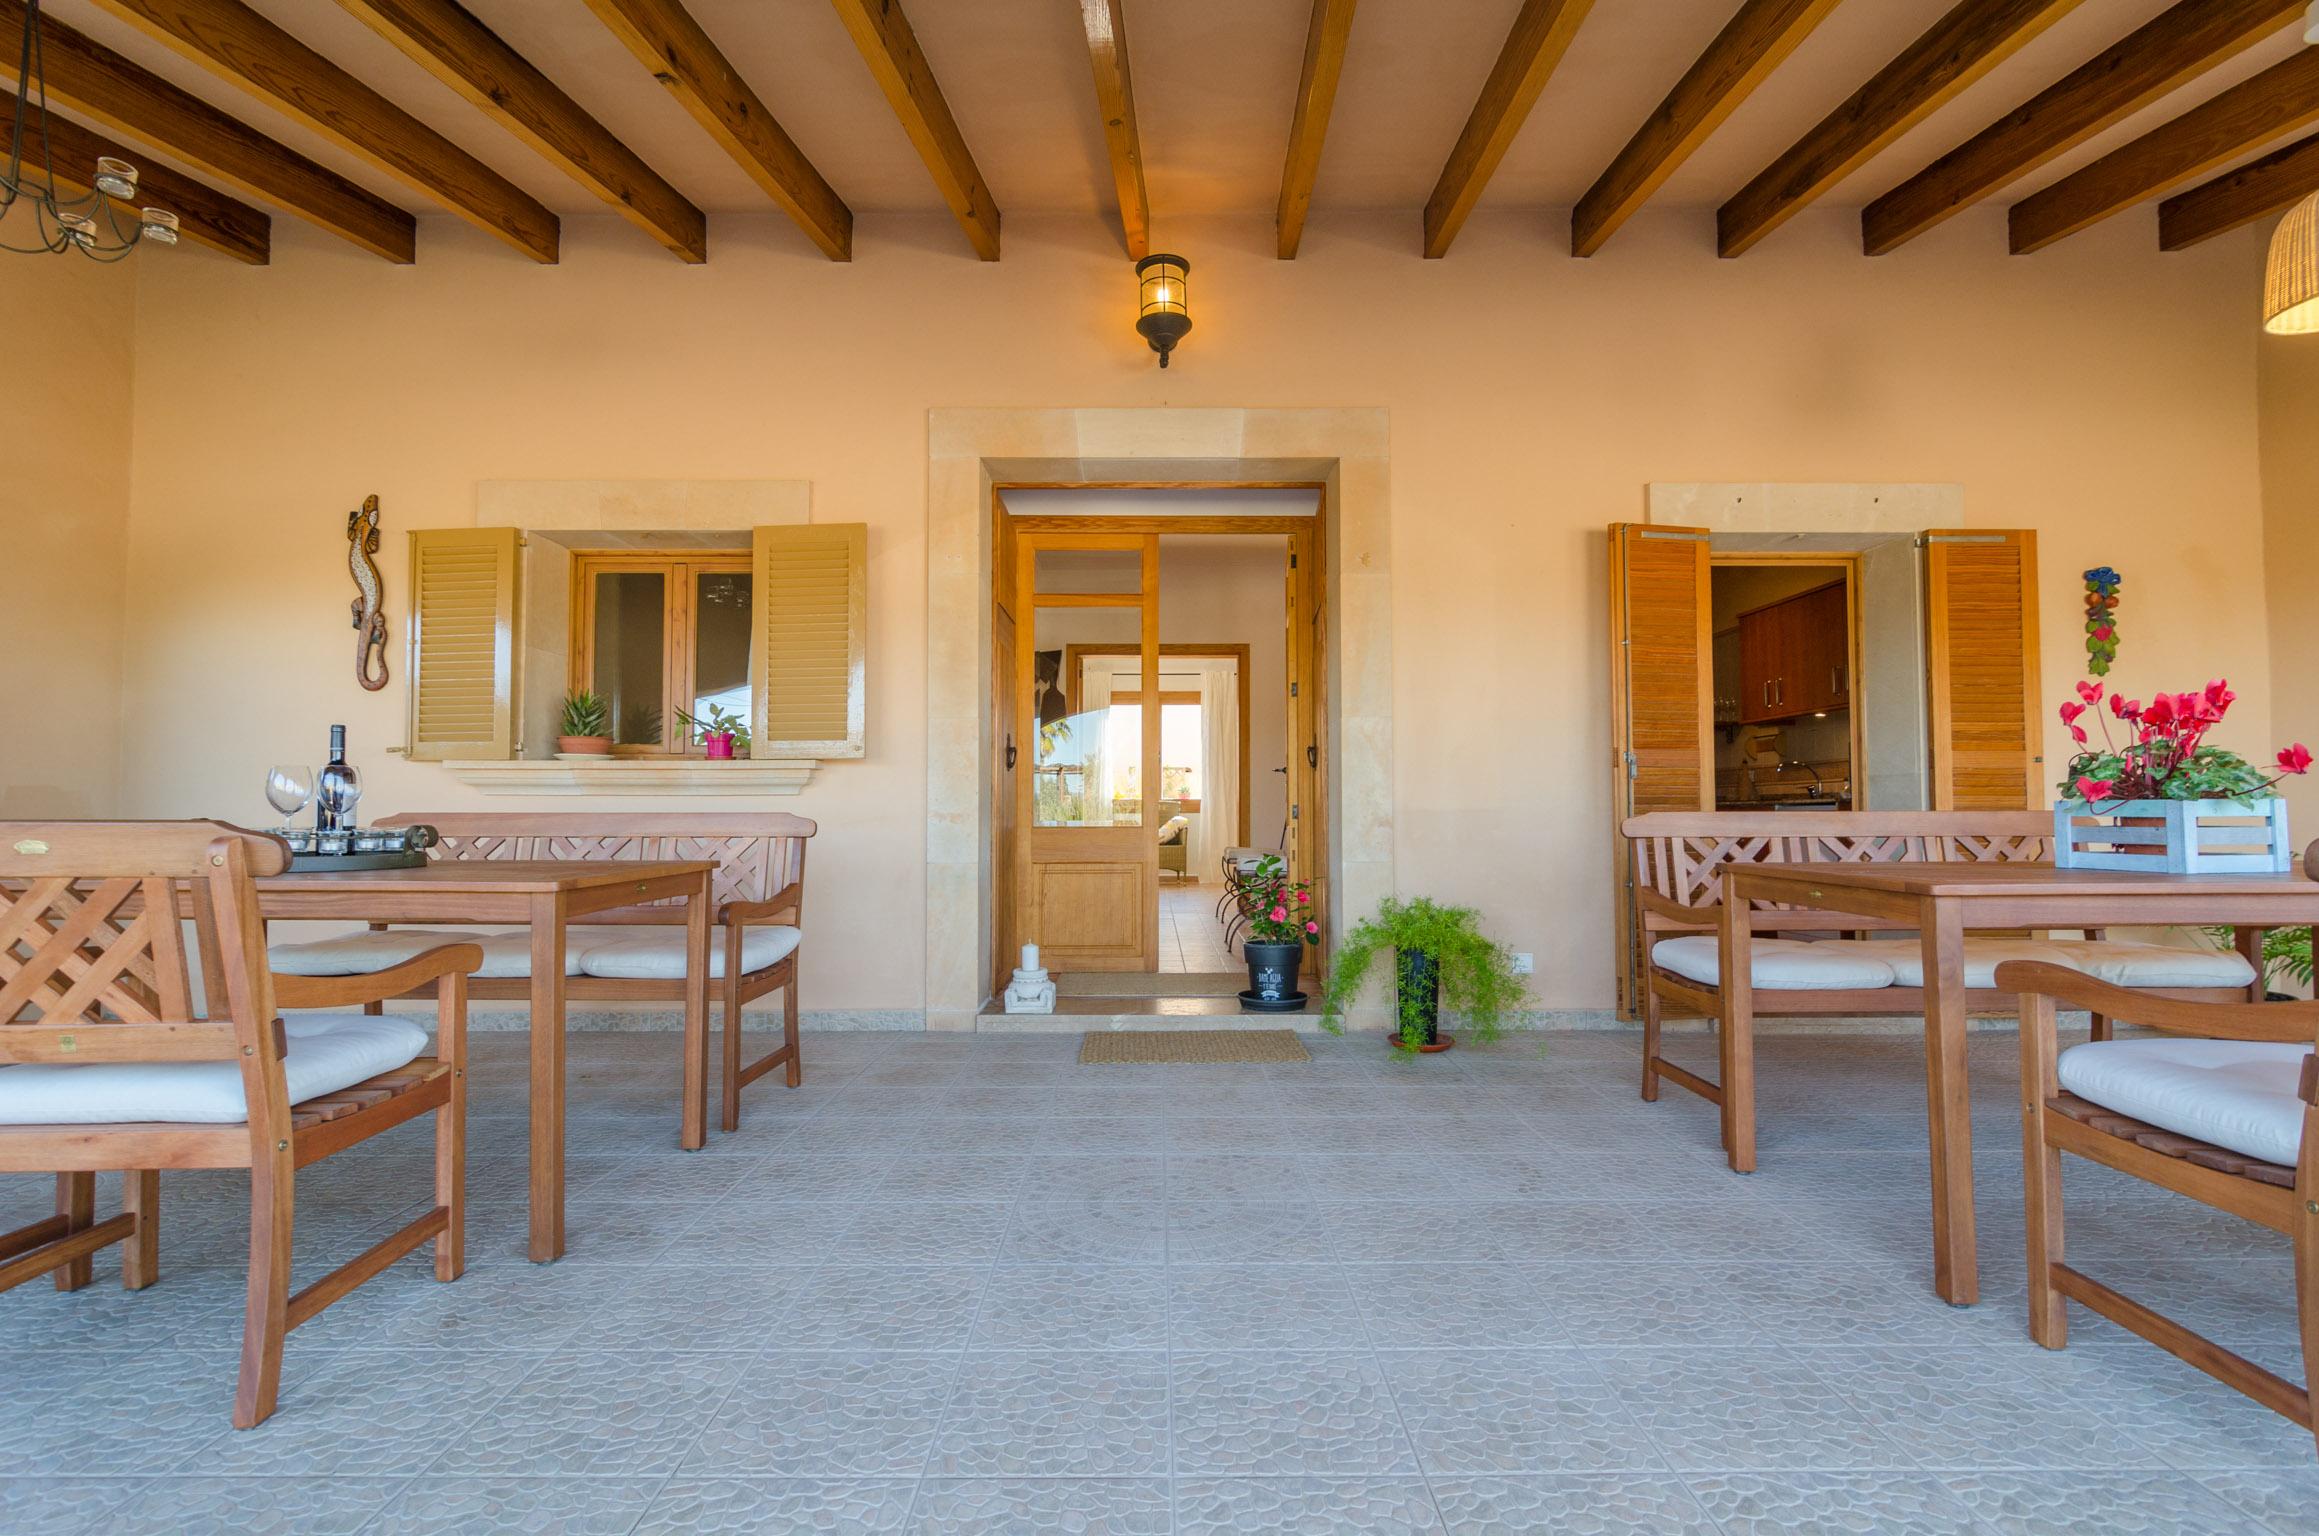 Ferienhaus SANT BLAI VELL (2284789), Campos, Mallorca, Balearische Inseln, Spanien, Bild 10